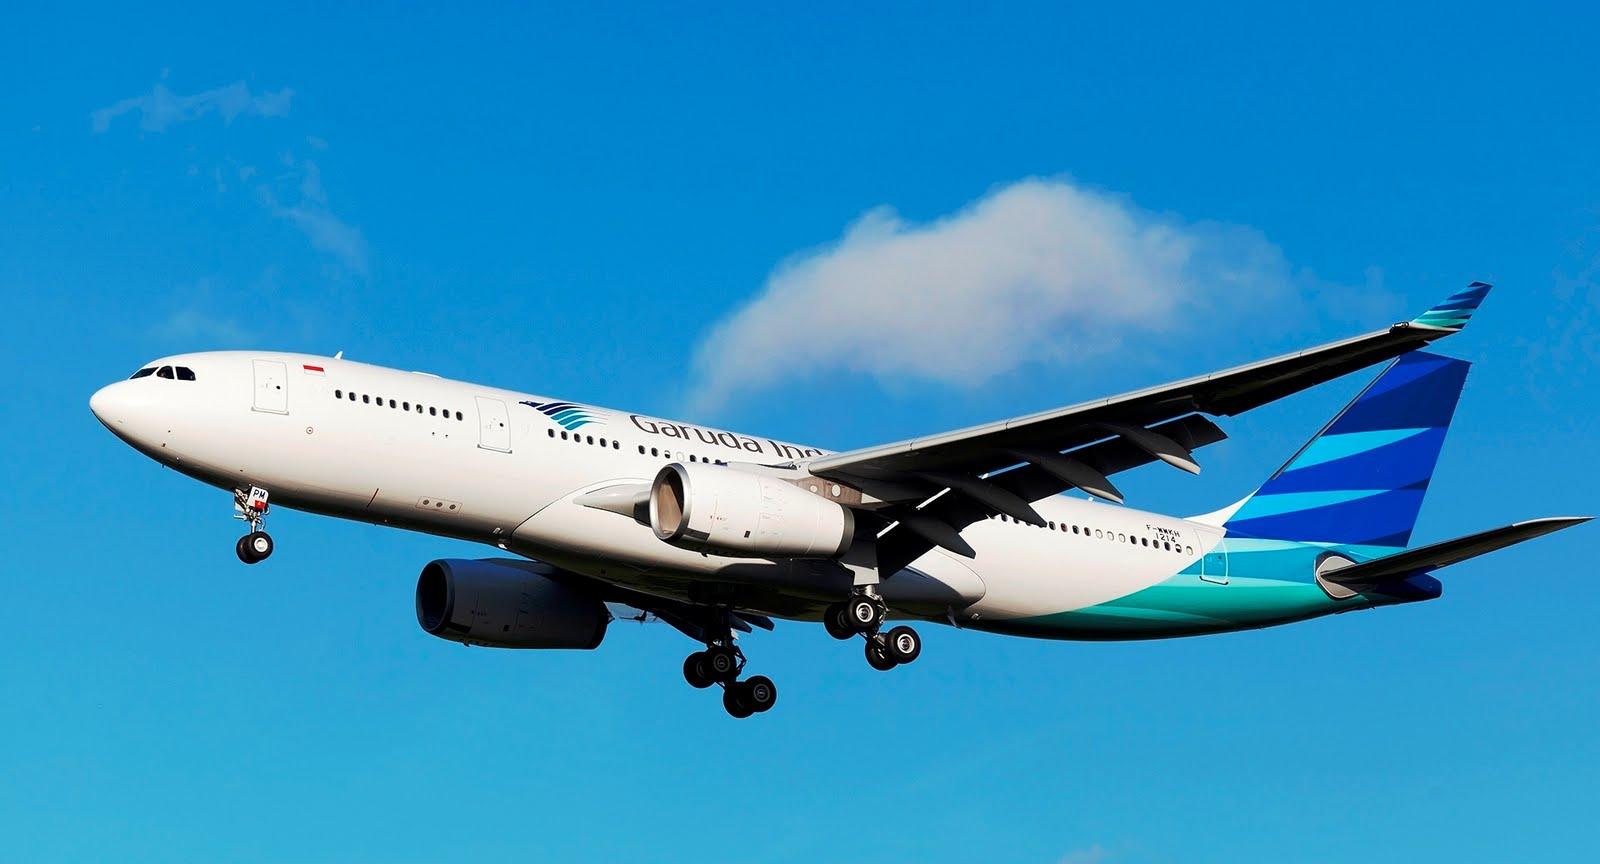 http://4.bp.blogspot.com/-NEjquZ1Uxgc/TjiA1XEg5-I/AAAAAAAAGJg/nLNT39lue_8/s1600/airbus_a330_200_garuda_indonesia_87658_aircraft-wallpaper.jpg